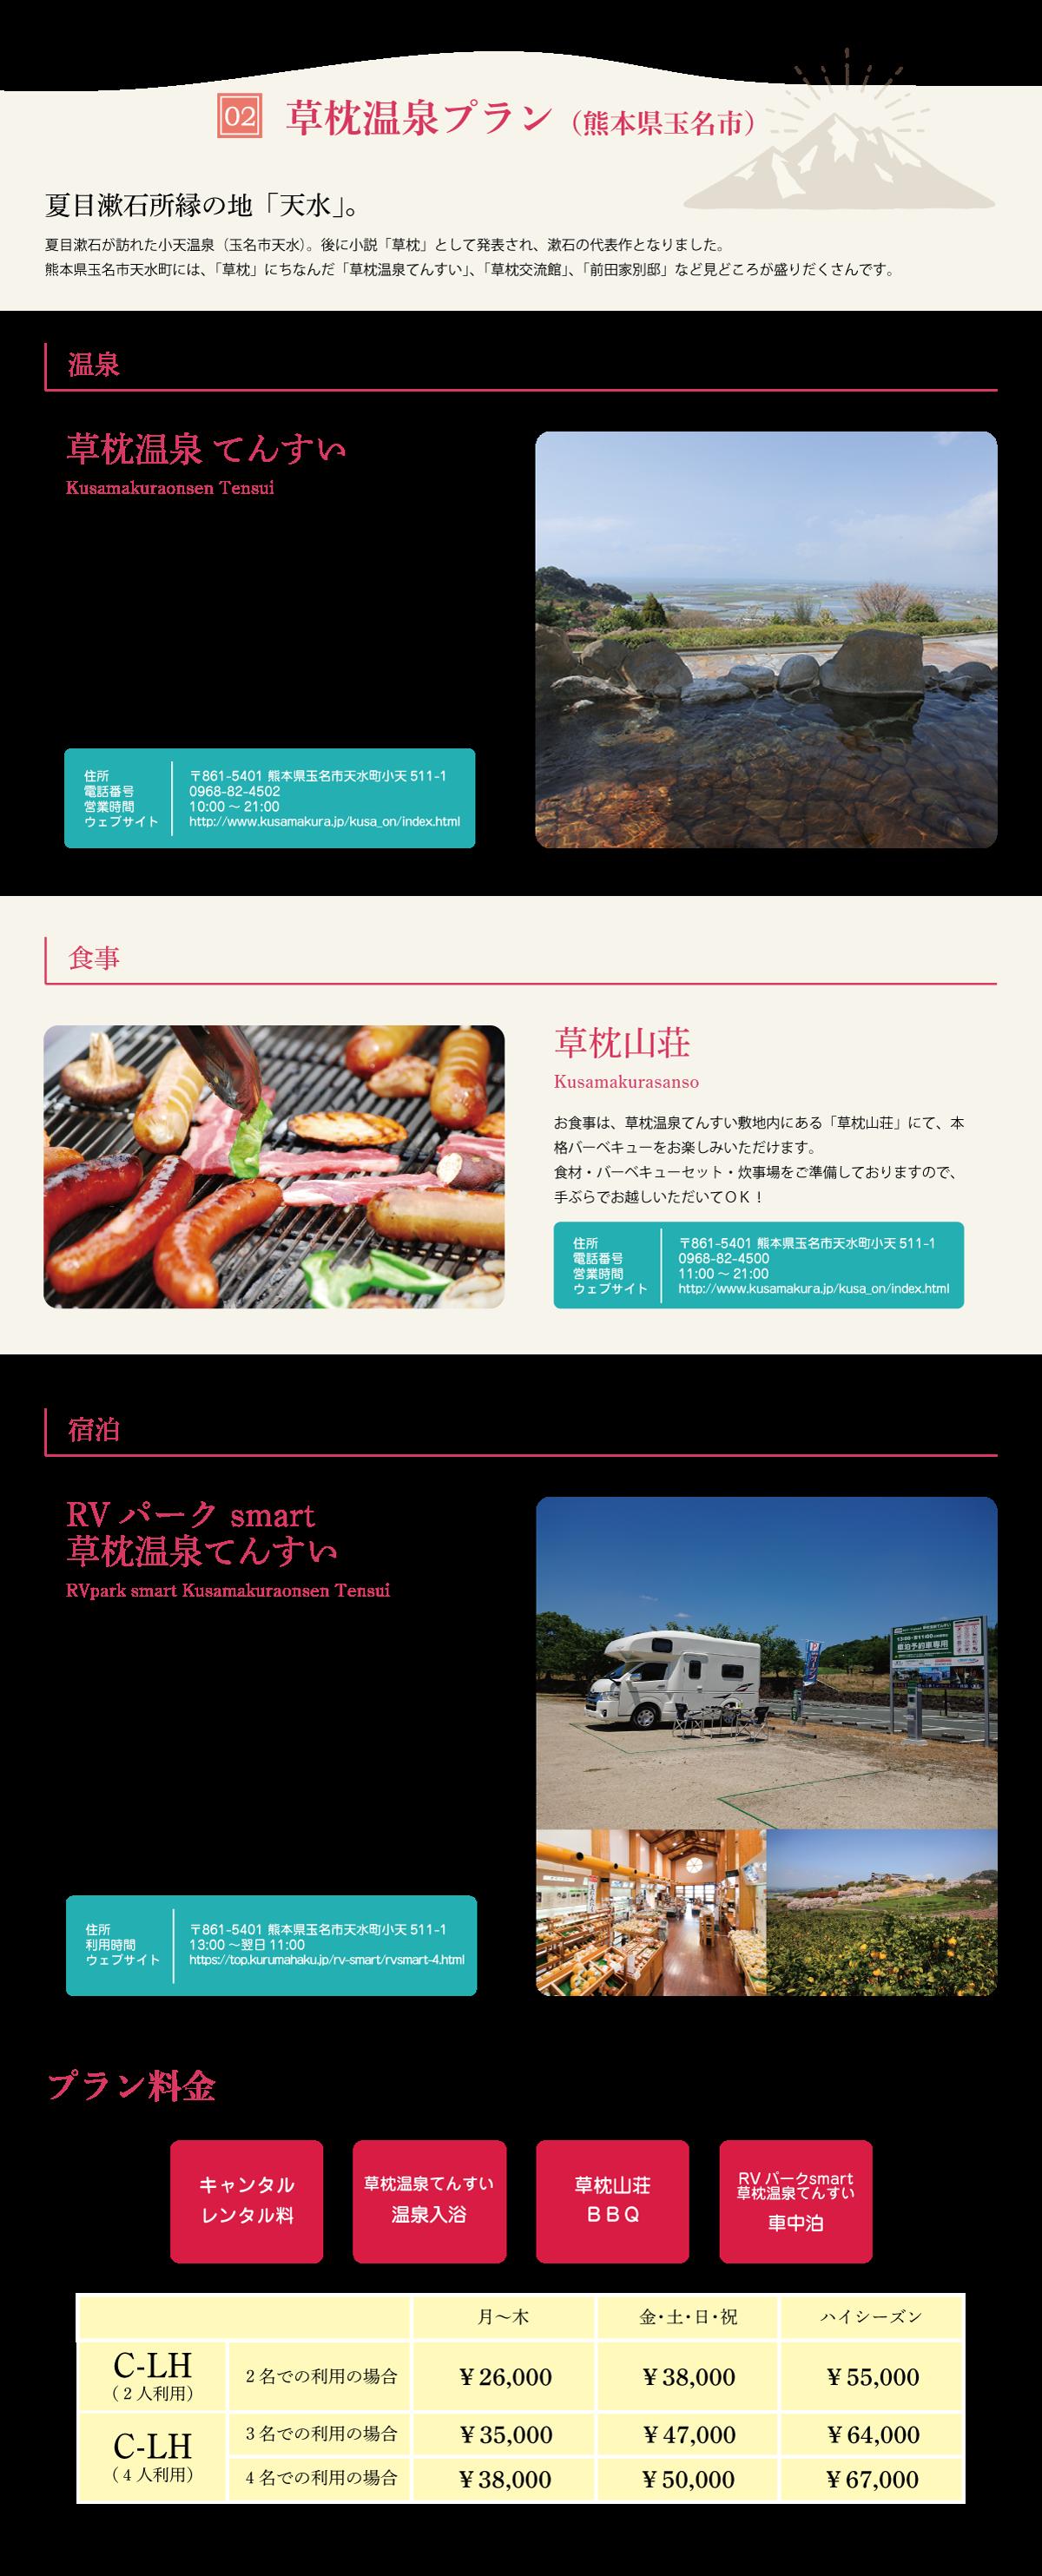 kyushumap2